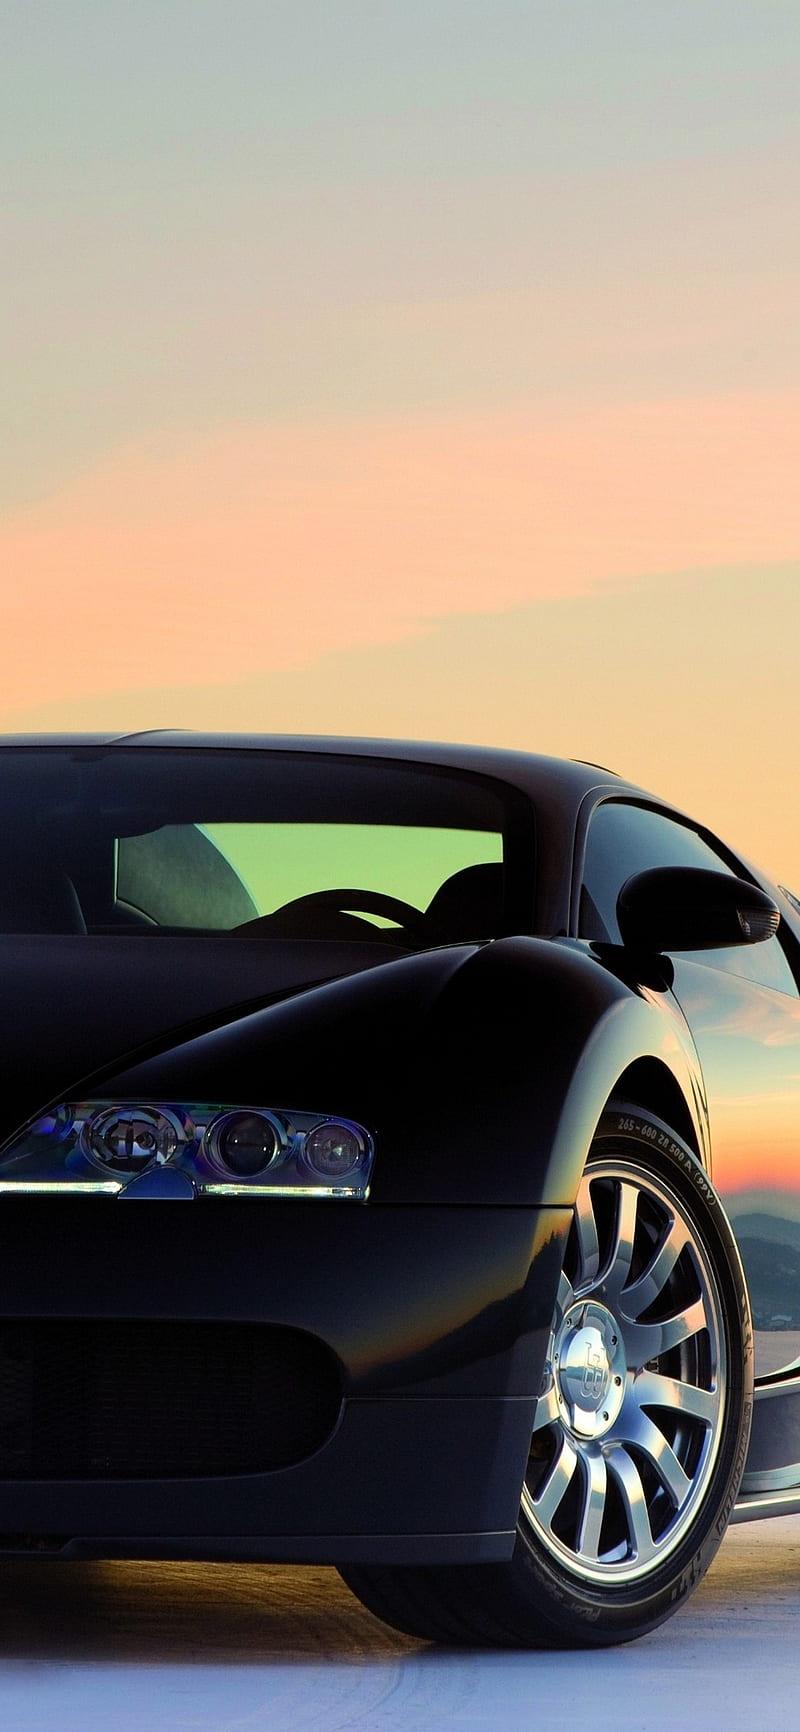 Toyota supra drift live wallpaper. Black Car Car Carros Corvette Iphone Iphonex Super Hd Mobile Wallpaper Peakpx